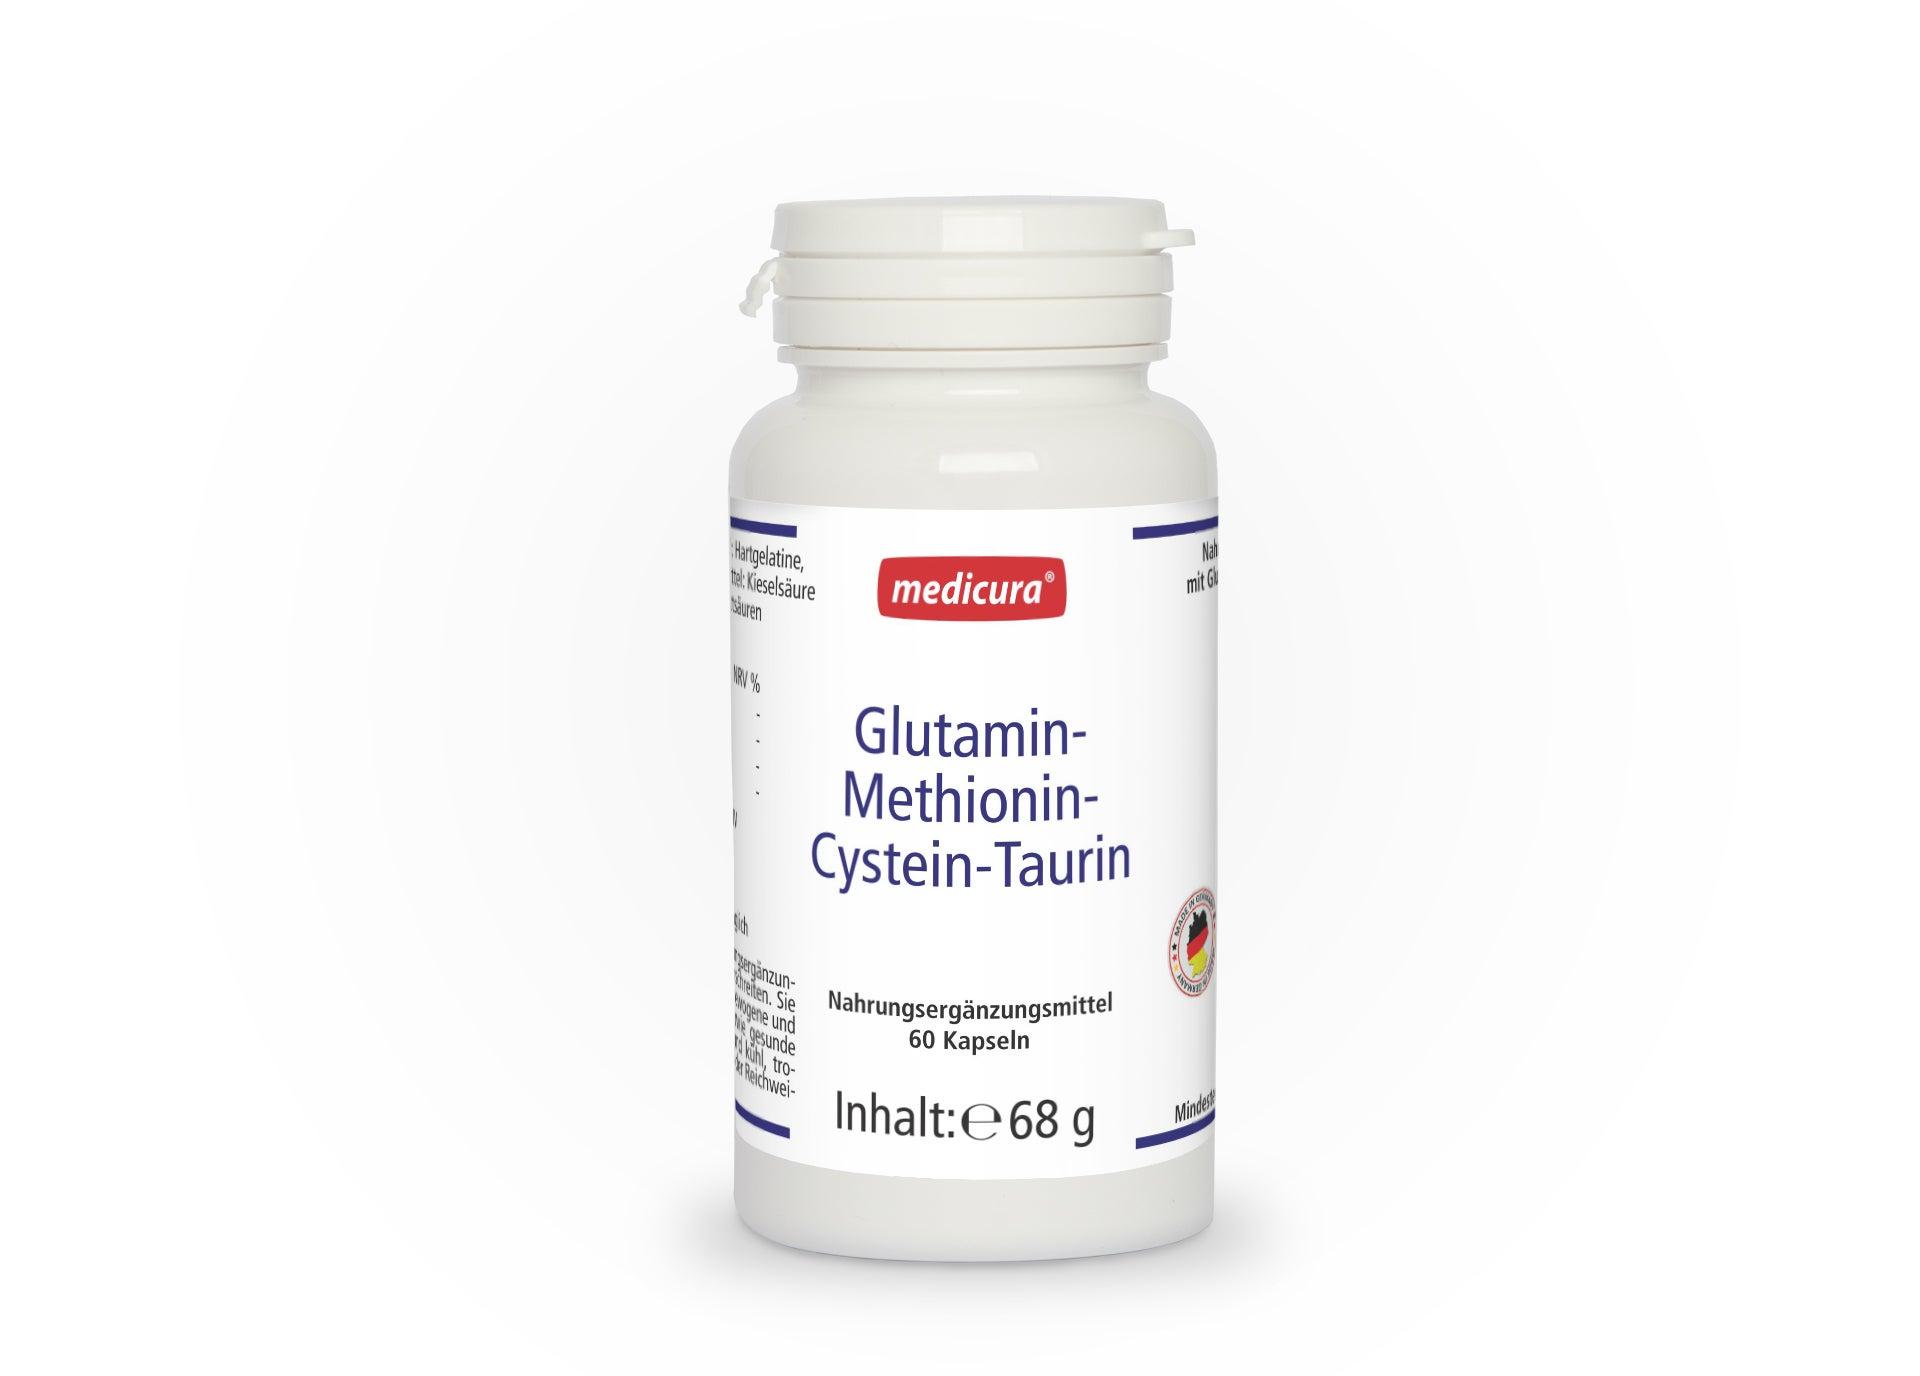 Glutamin - Methionin - Cystein - Taurin - 60 Kapseln